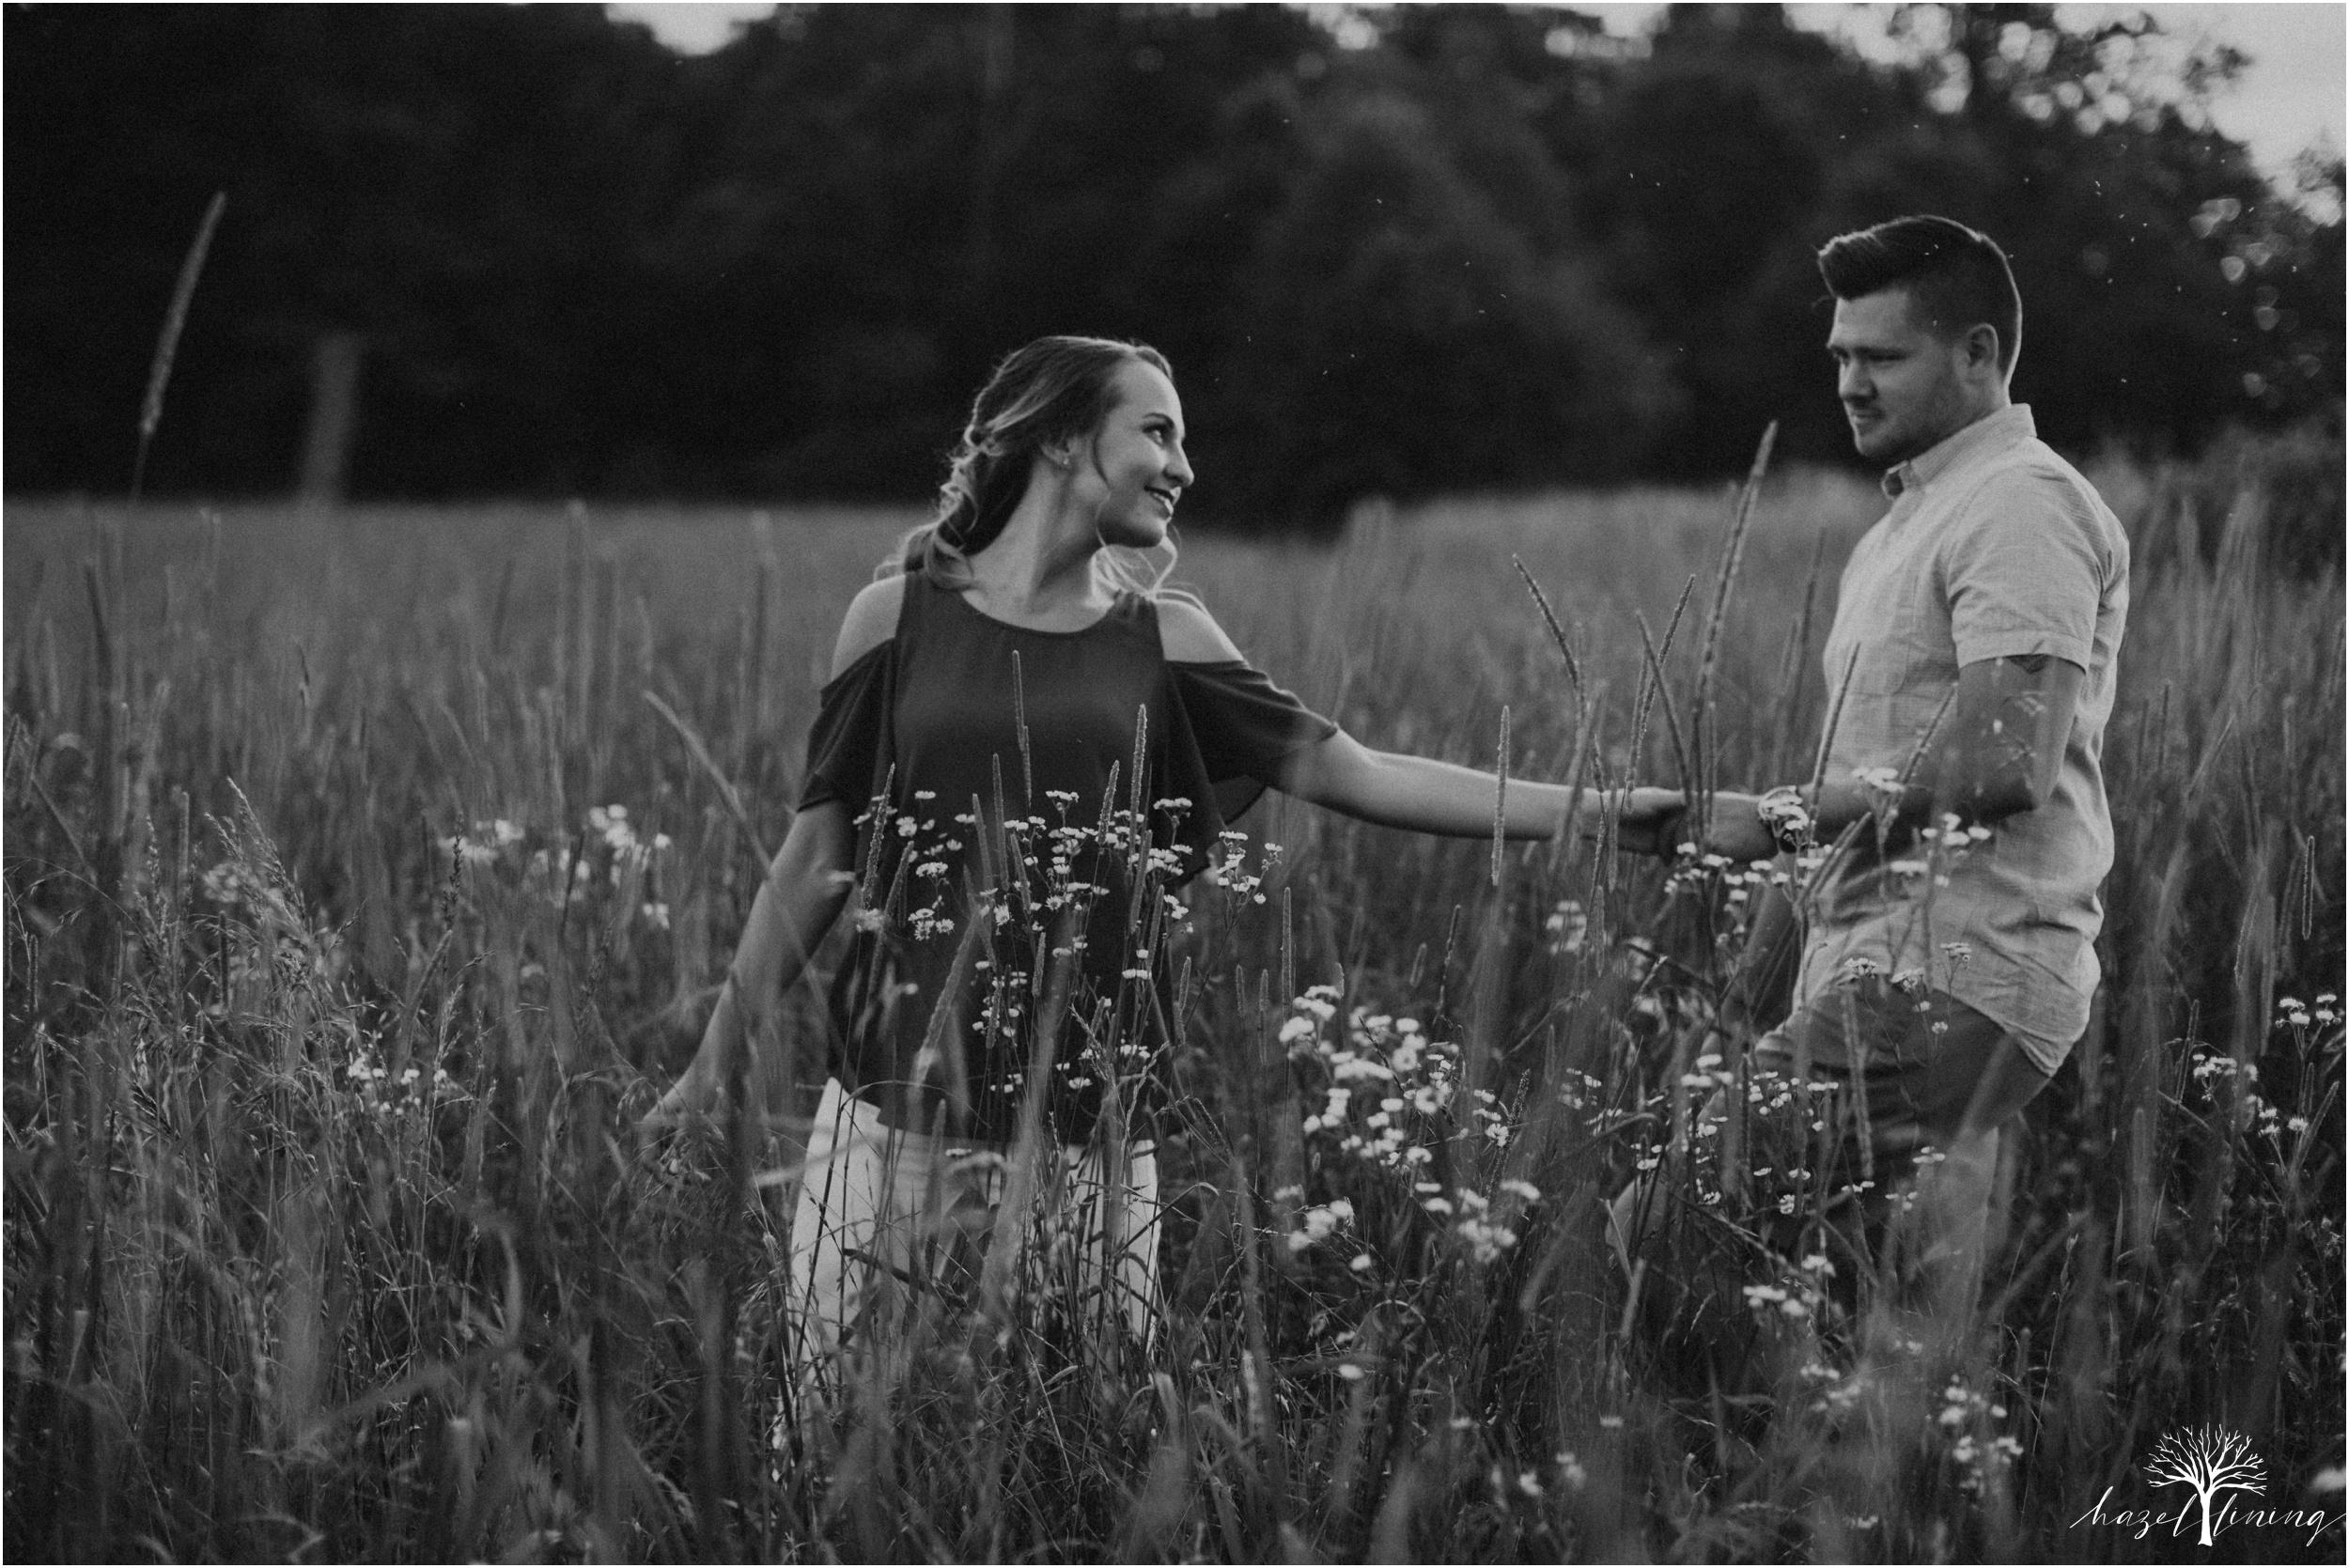 rachel-warner-chris-niedrist-the-farm-bakery-and-events-quakertown-pa-summer-engagement-hazel-lining-photography-destination-elopement-wedding-engagement-photography_0039.jpg